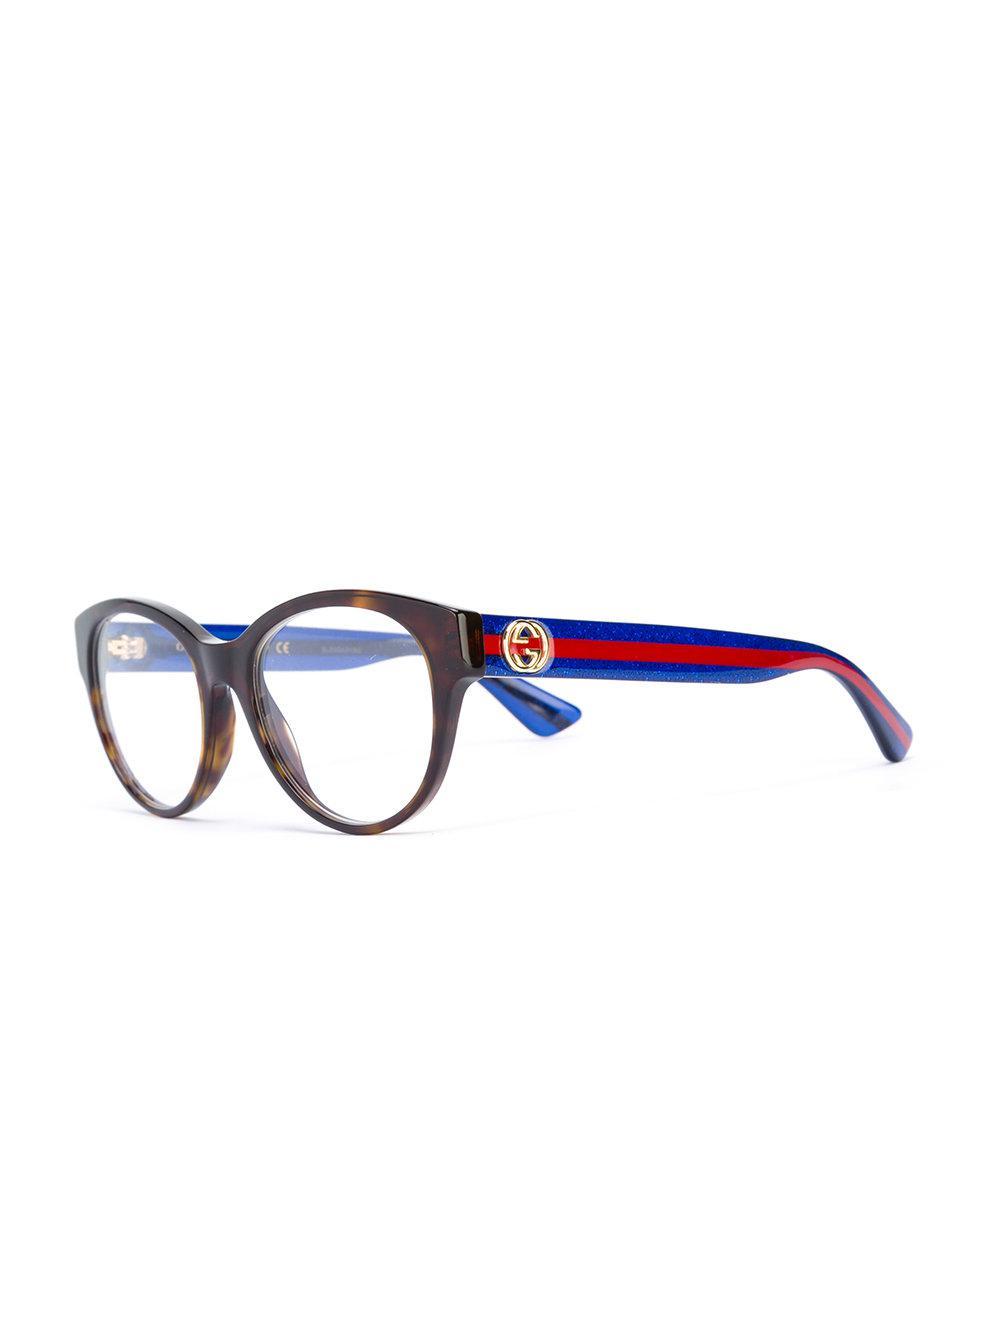 d8b6b1e0d9 Gucci - Blue Tortoiseshell Glasses - Lyst. View fullscreen